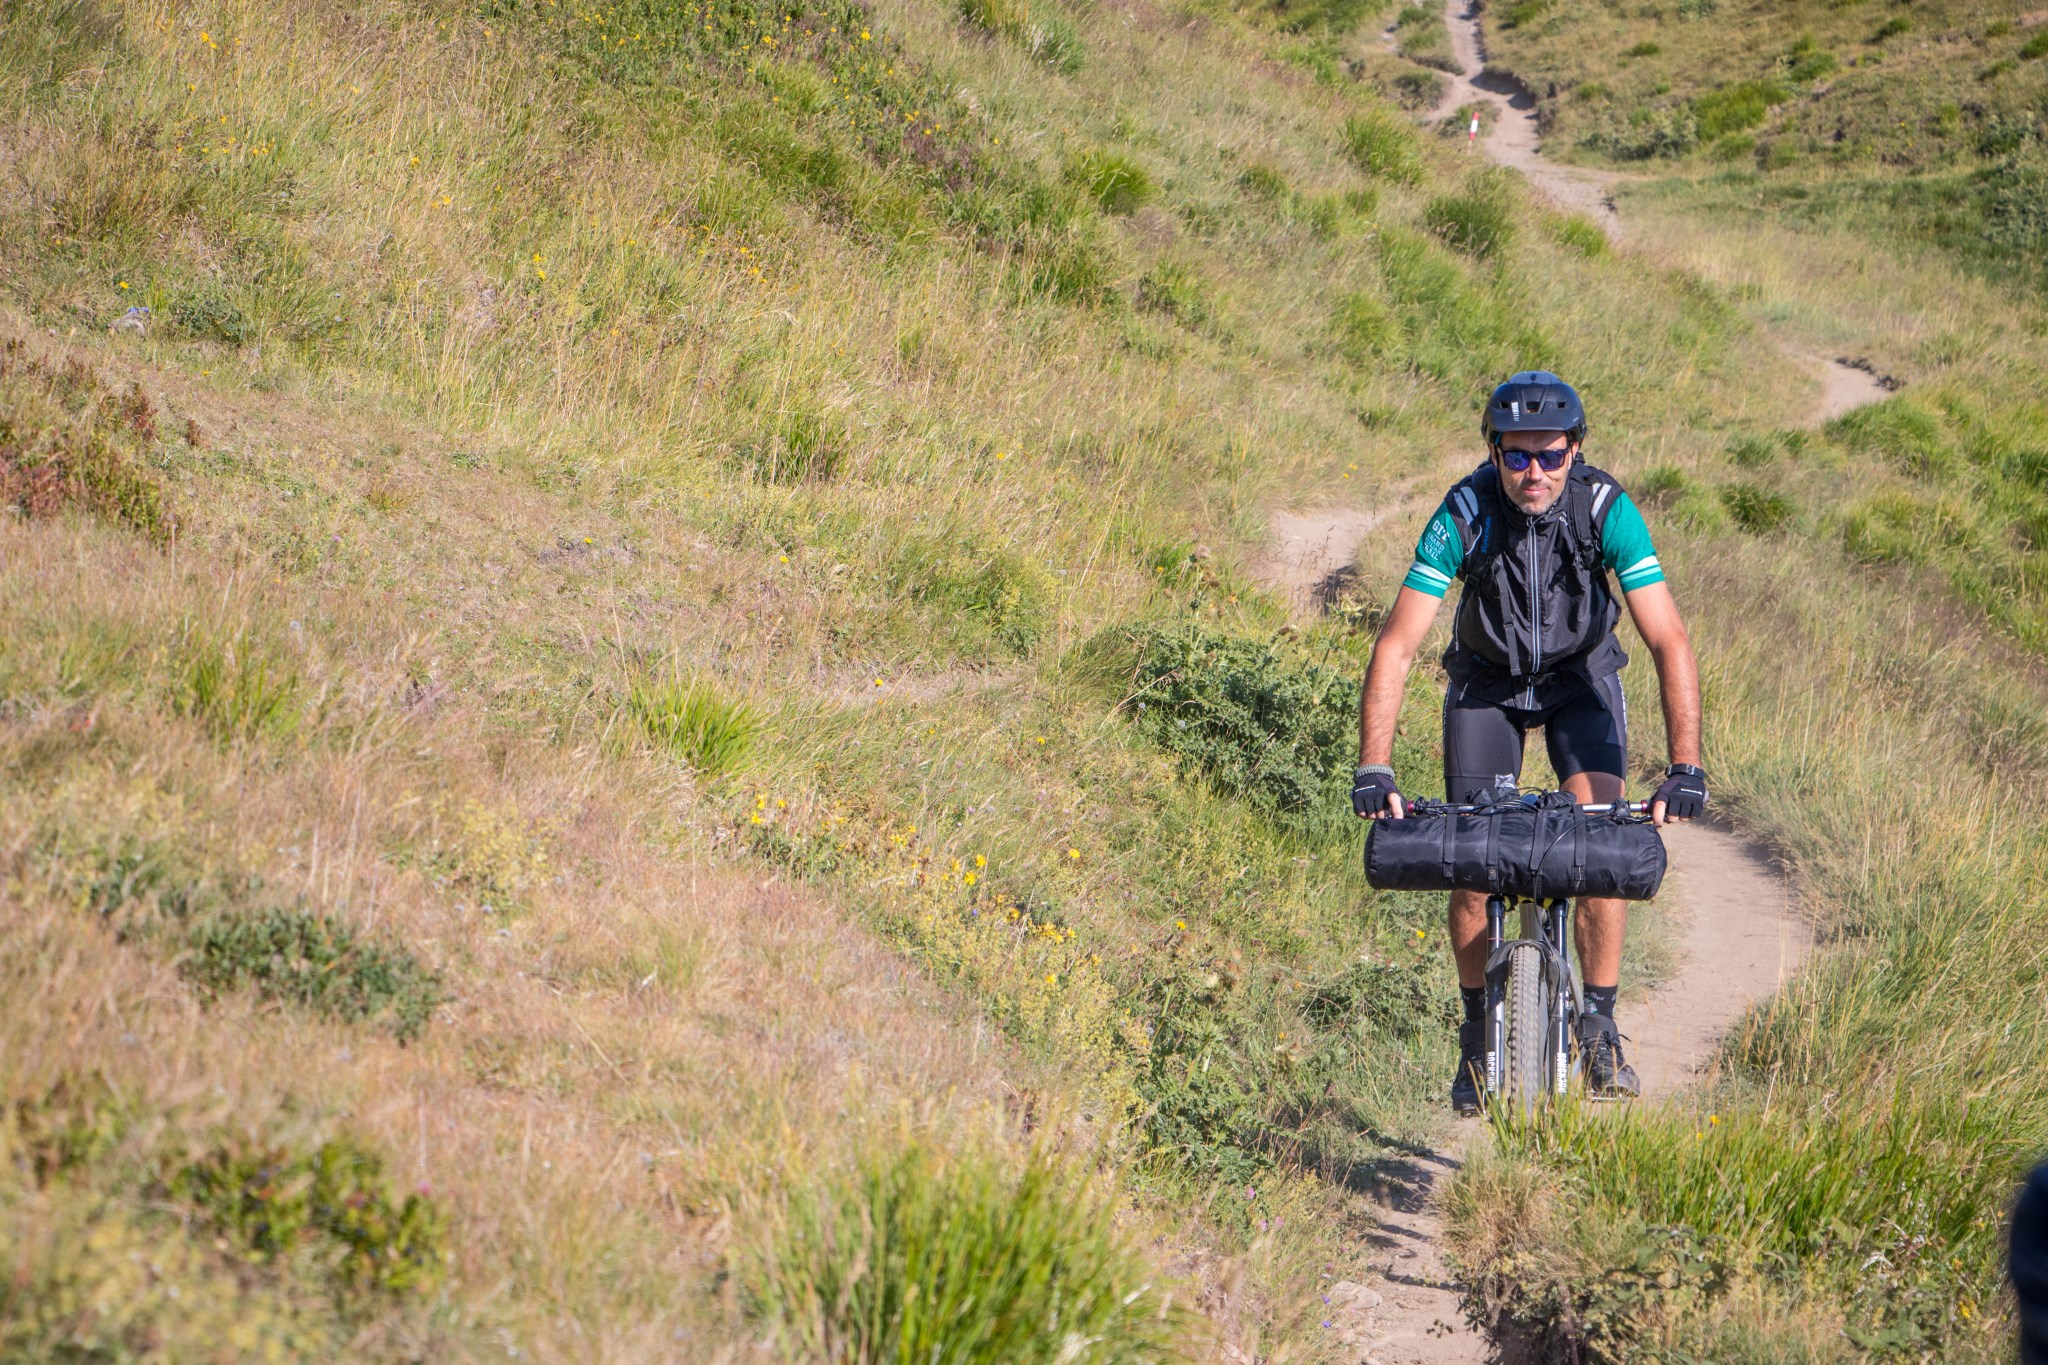 lago scaffaiolo overnight mtb bikepacking010